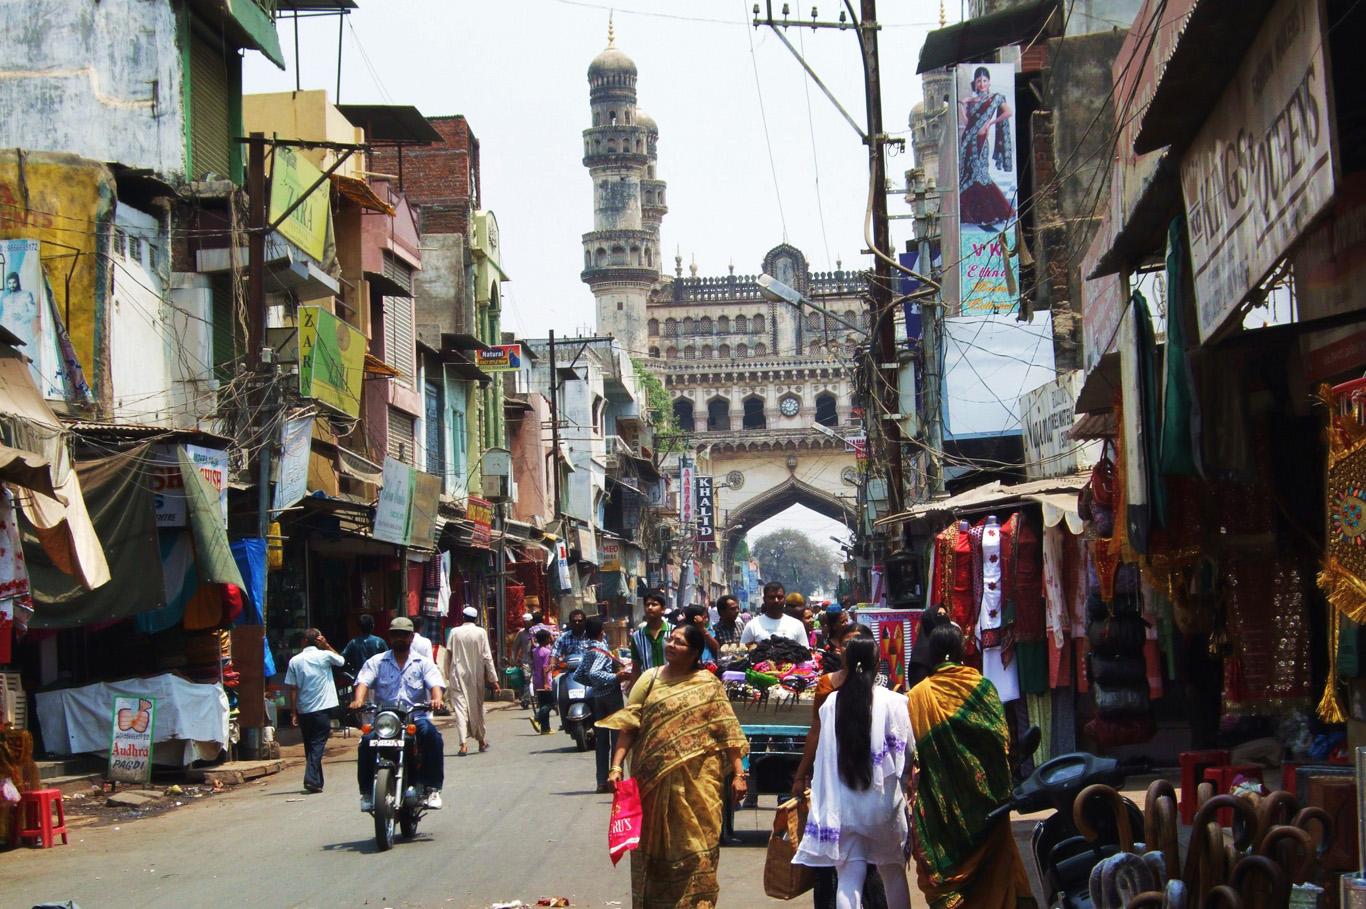 Street market in Hyderabad